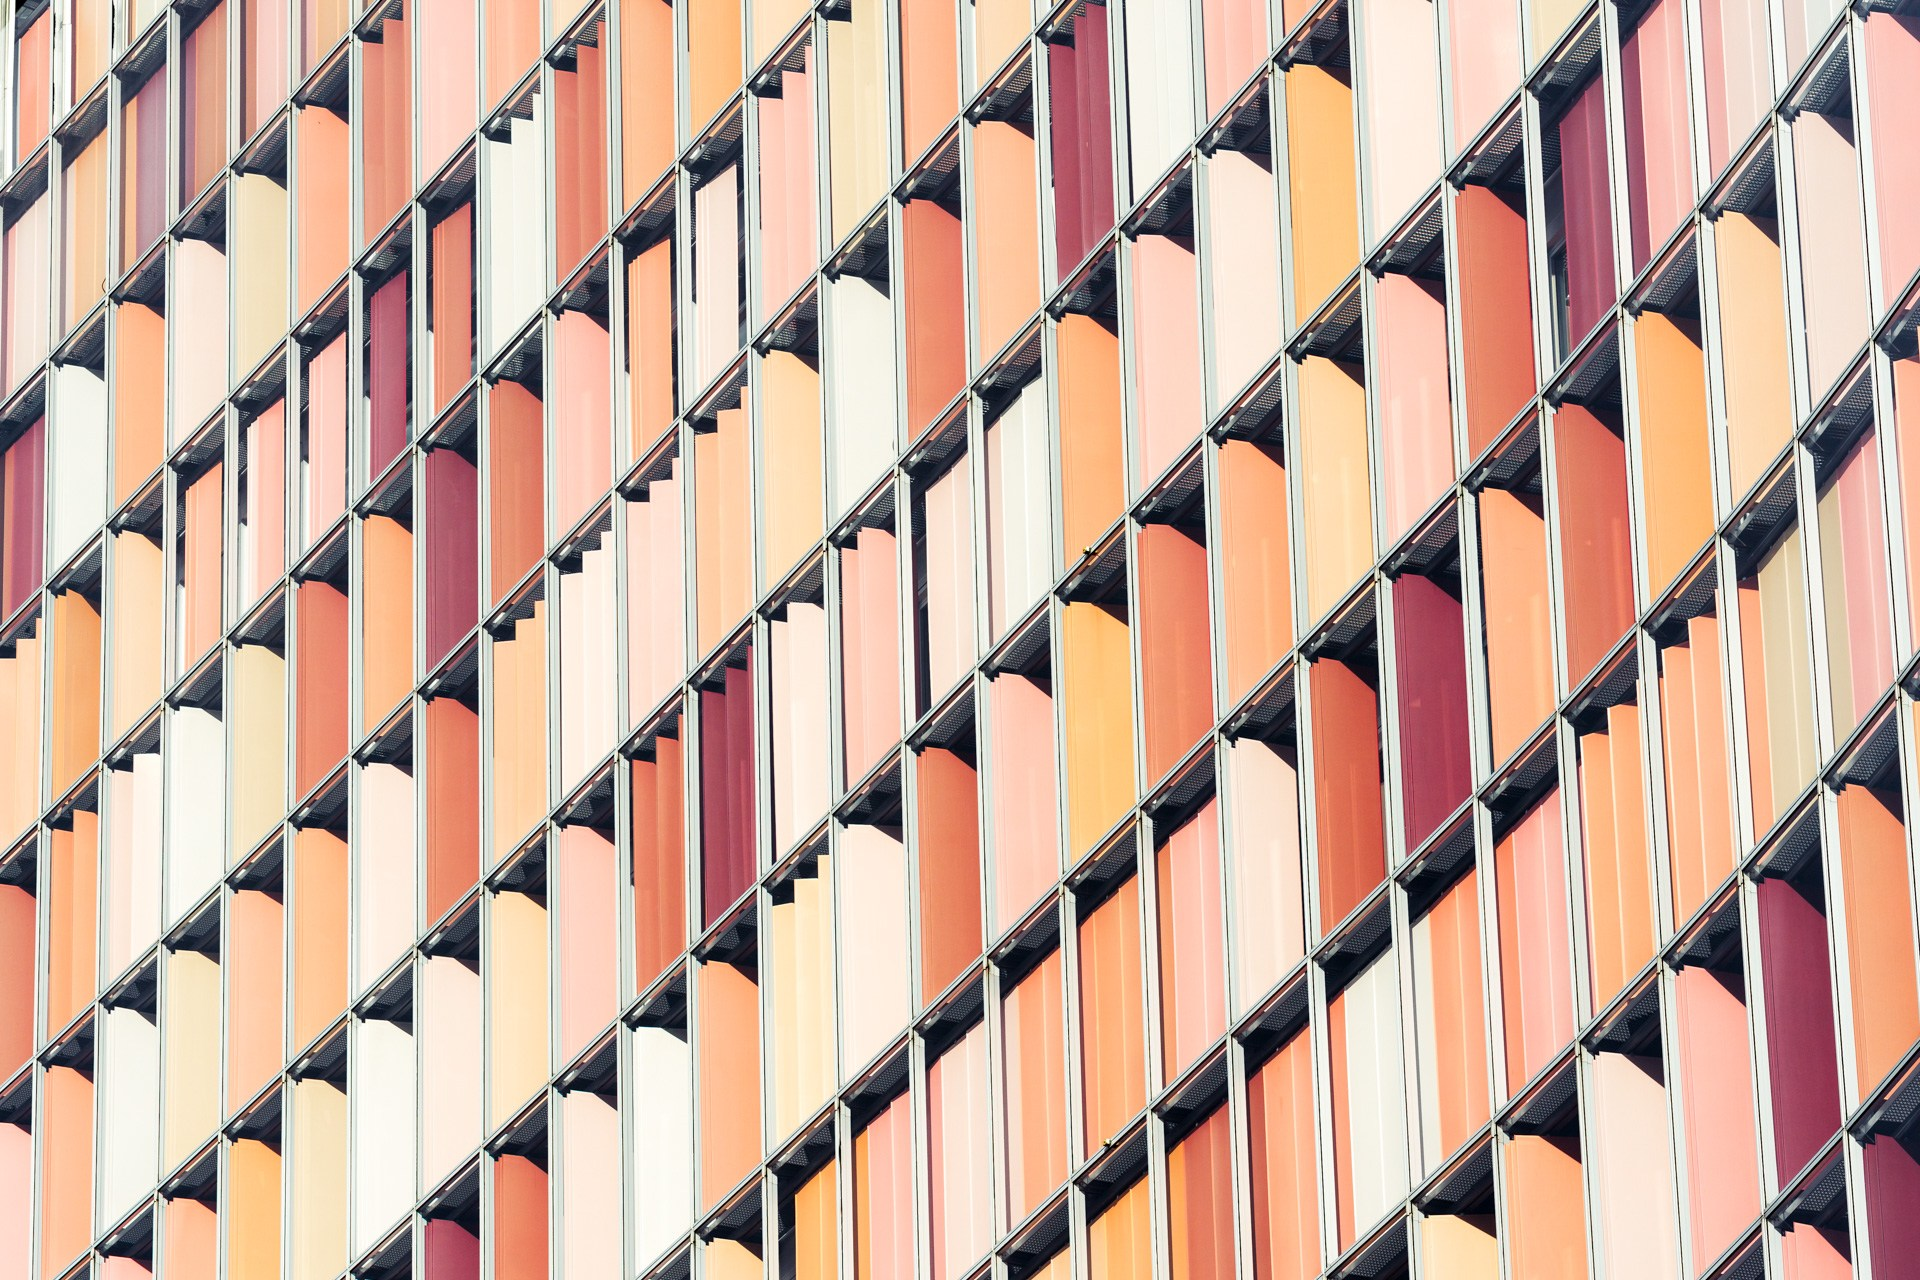 The Vivid Colors & Striking Textures of Berlin